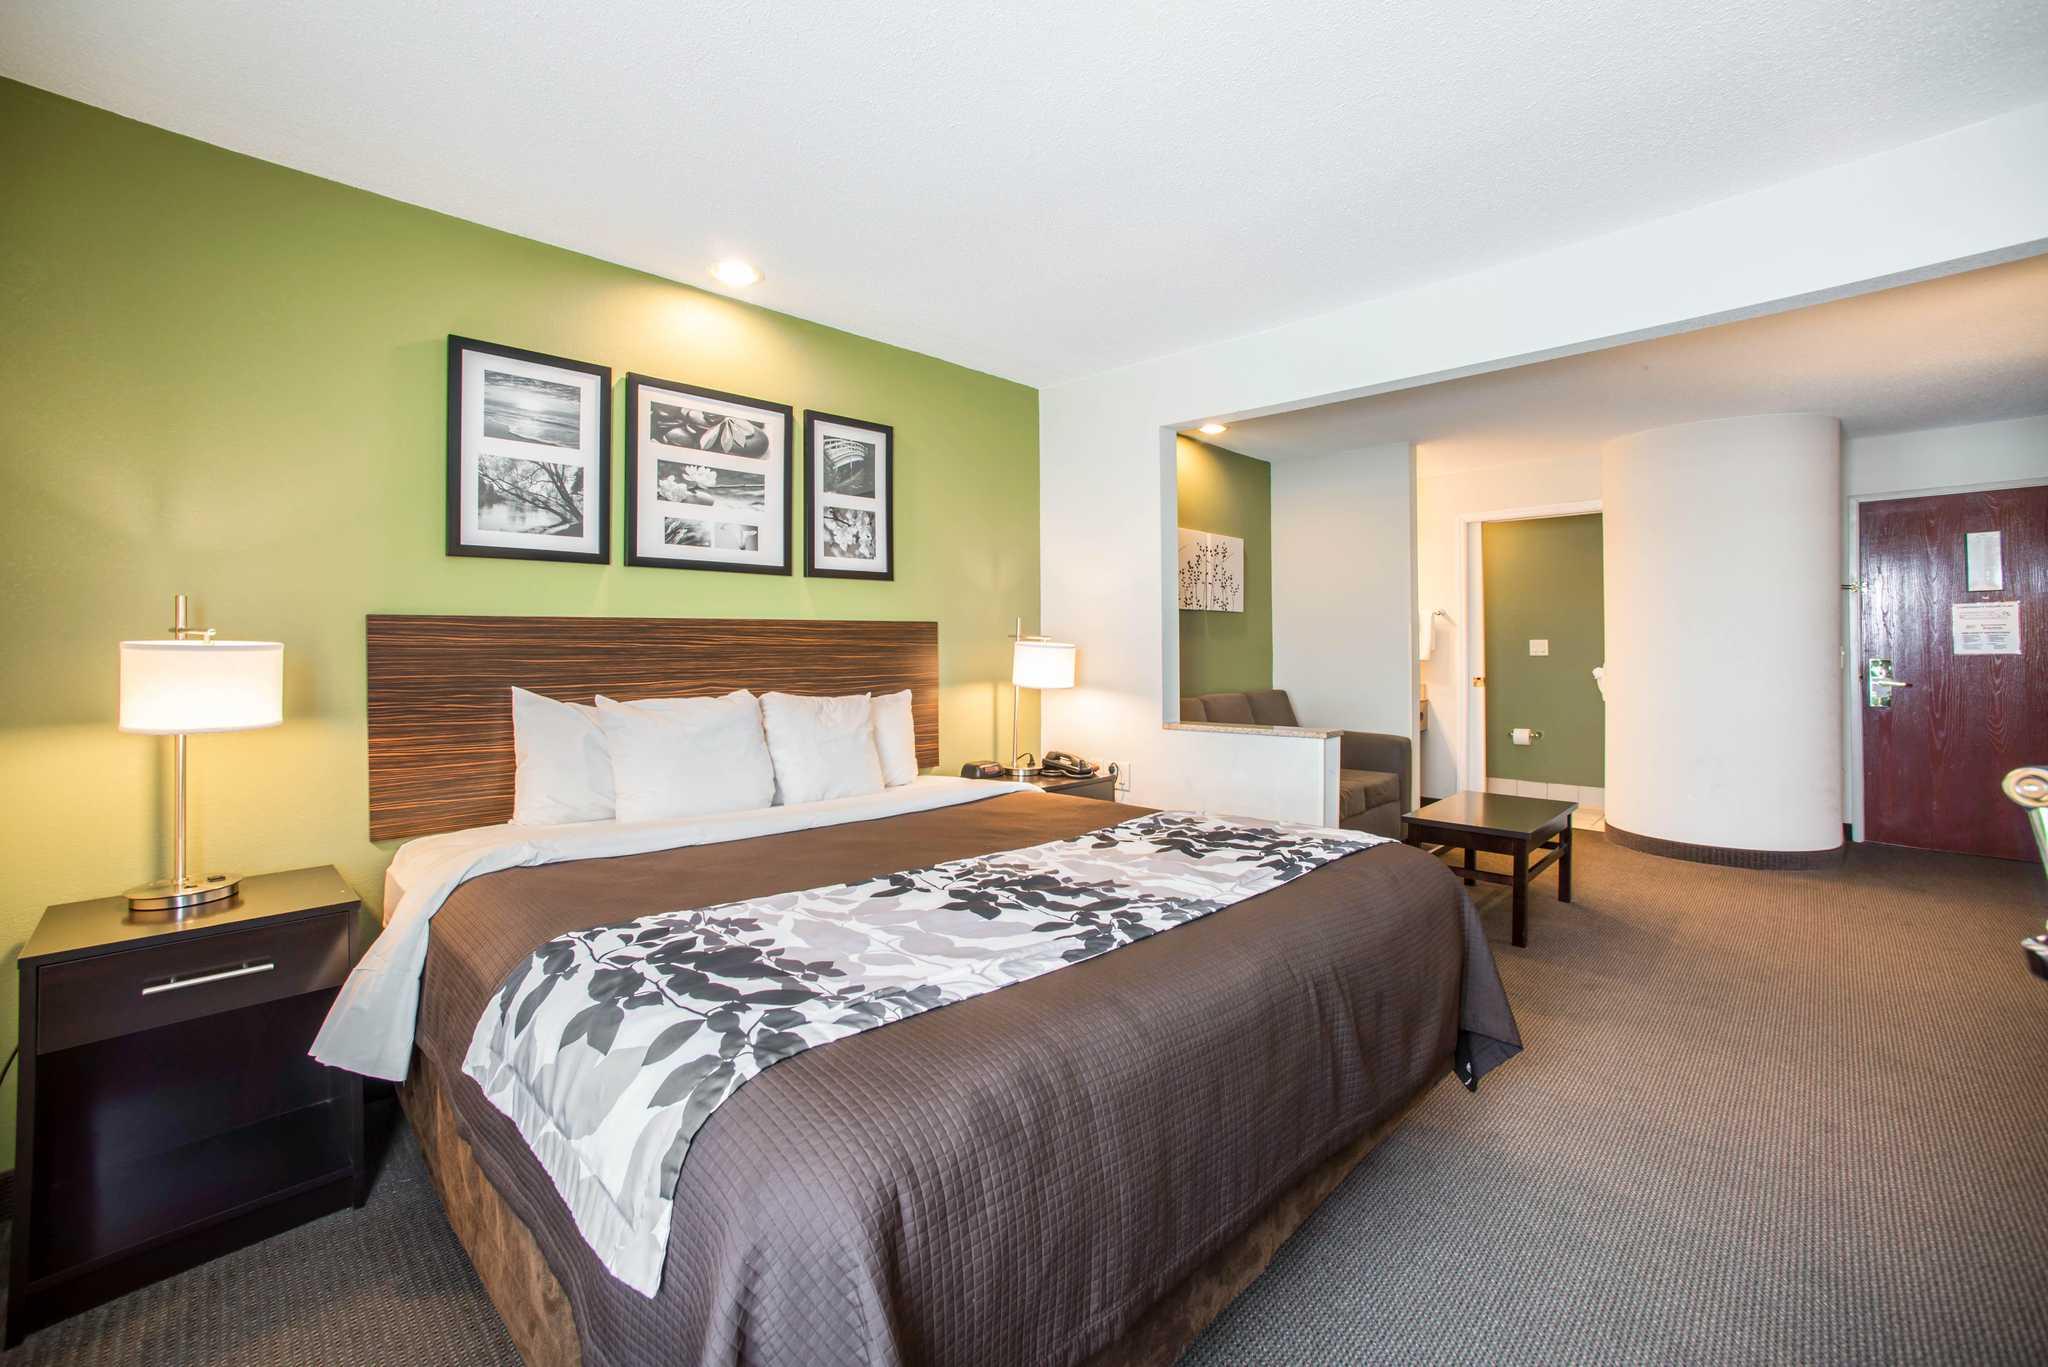 Sleep Inn - Decatur, IL 62521 - (217)872-7700 | ShowMeLocal.com